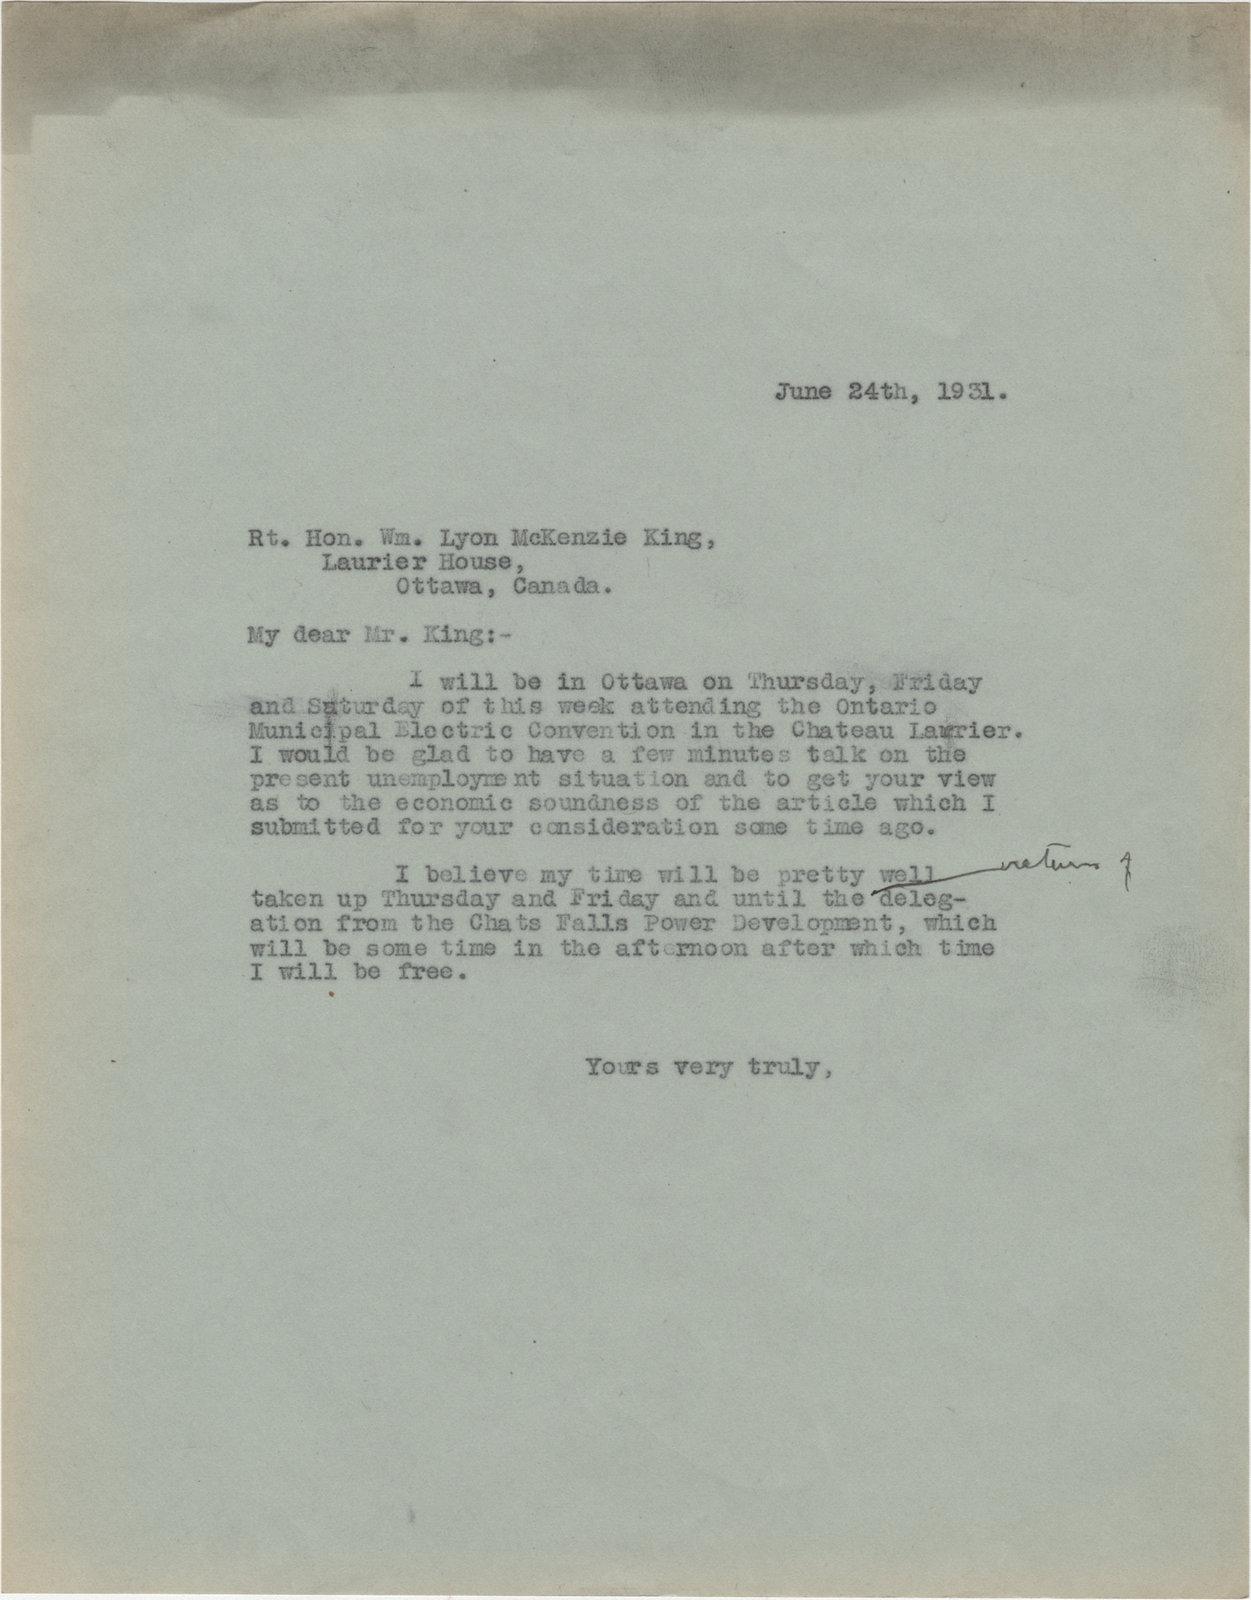 Letter from C. Mortimer Bezeau to William Lyon Mackenzie King , June 24, 1931